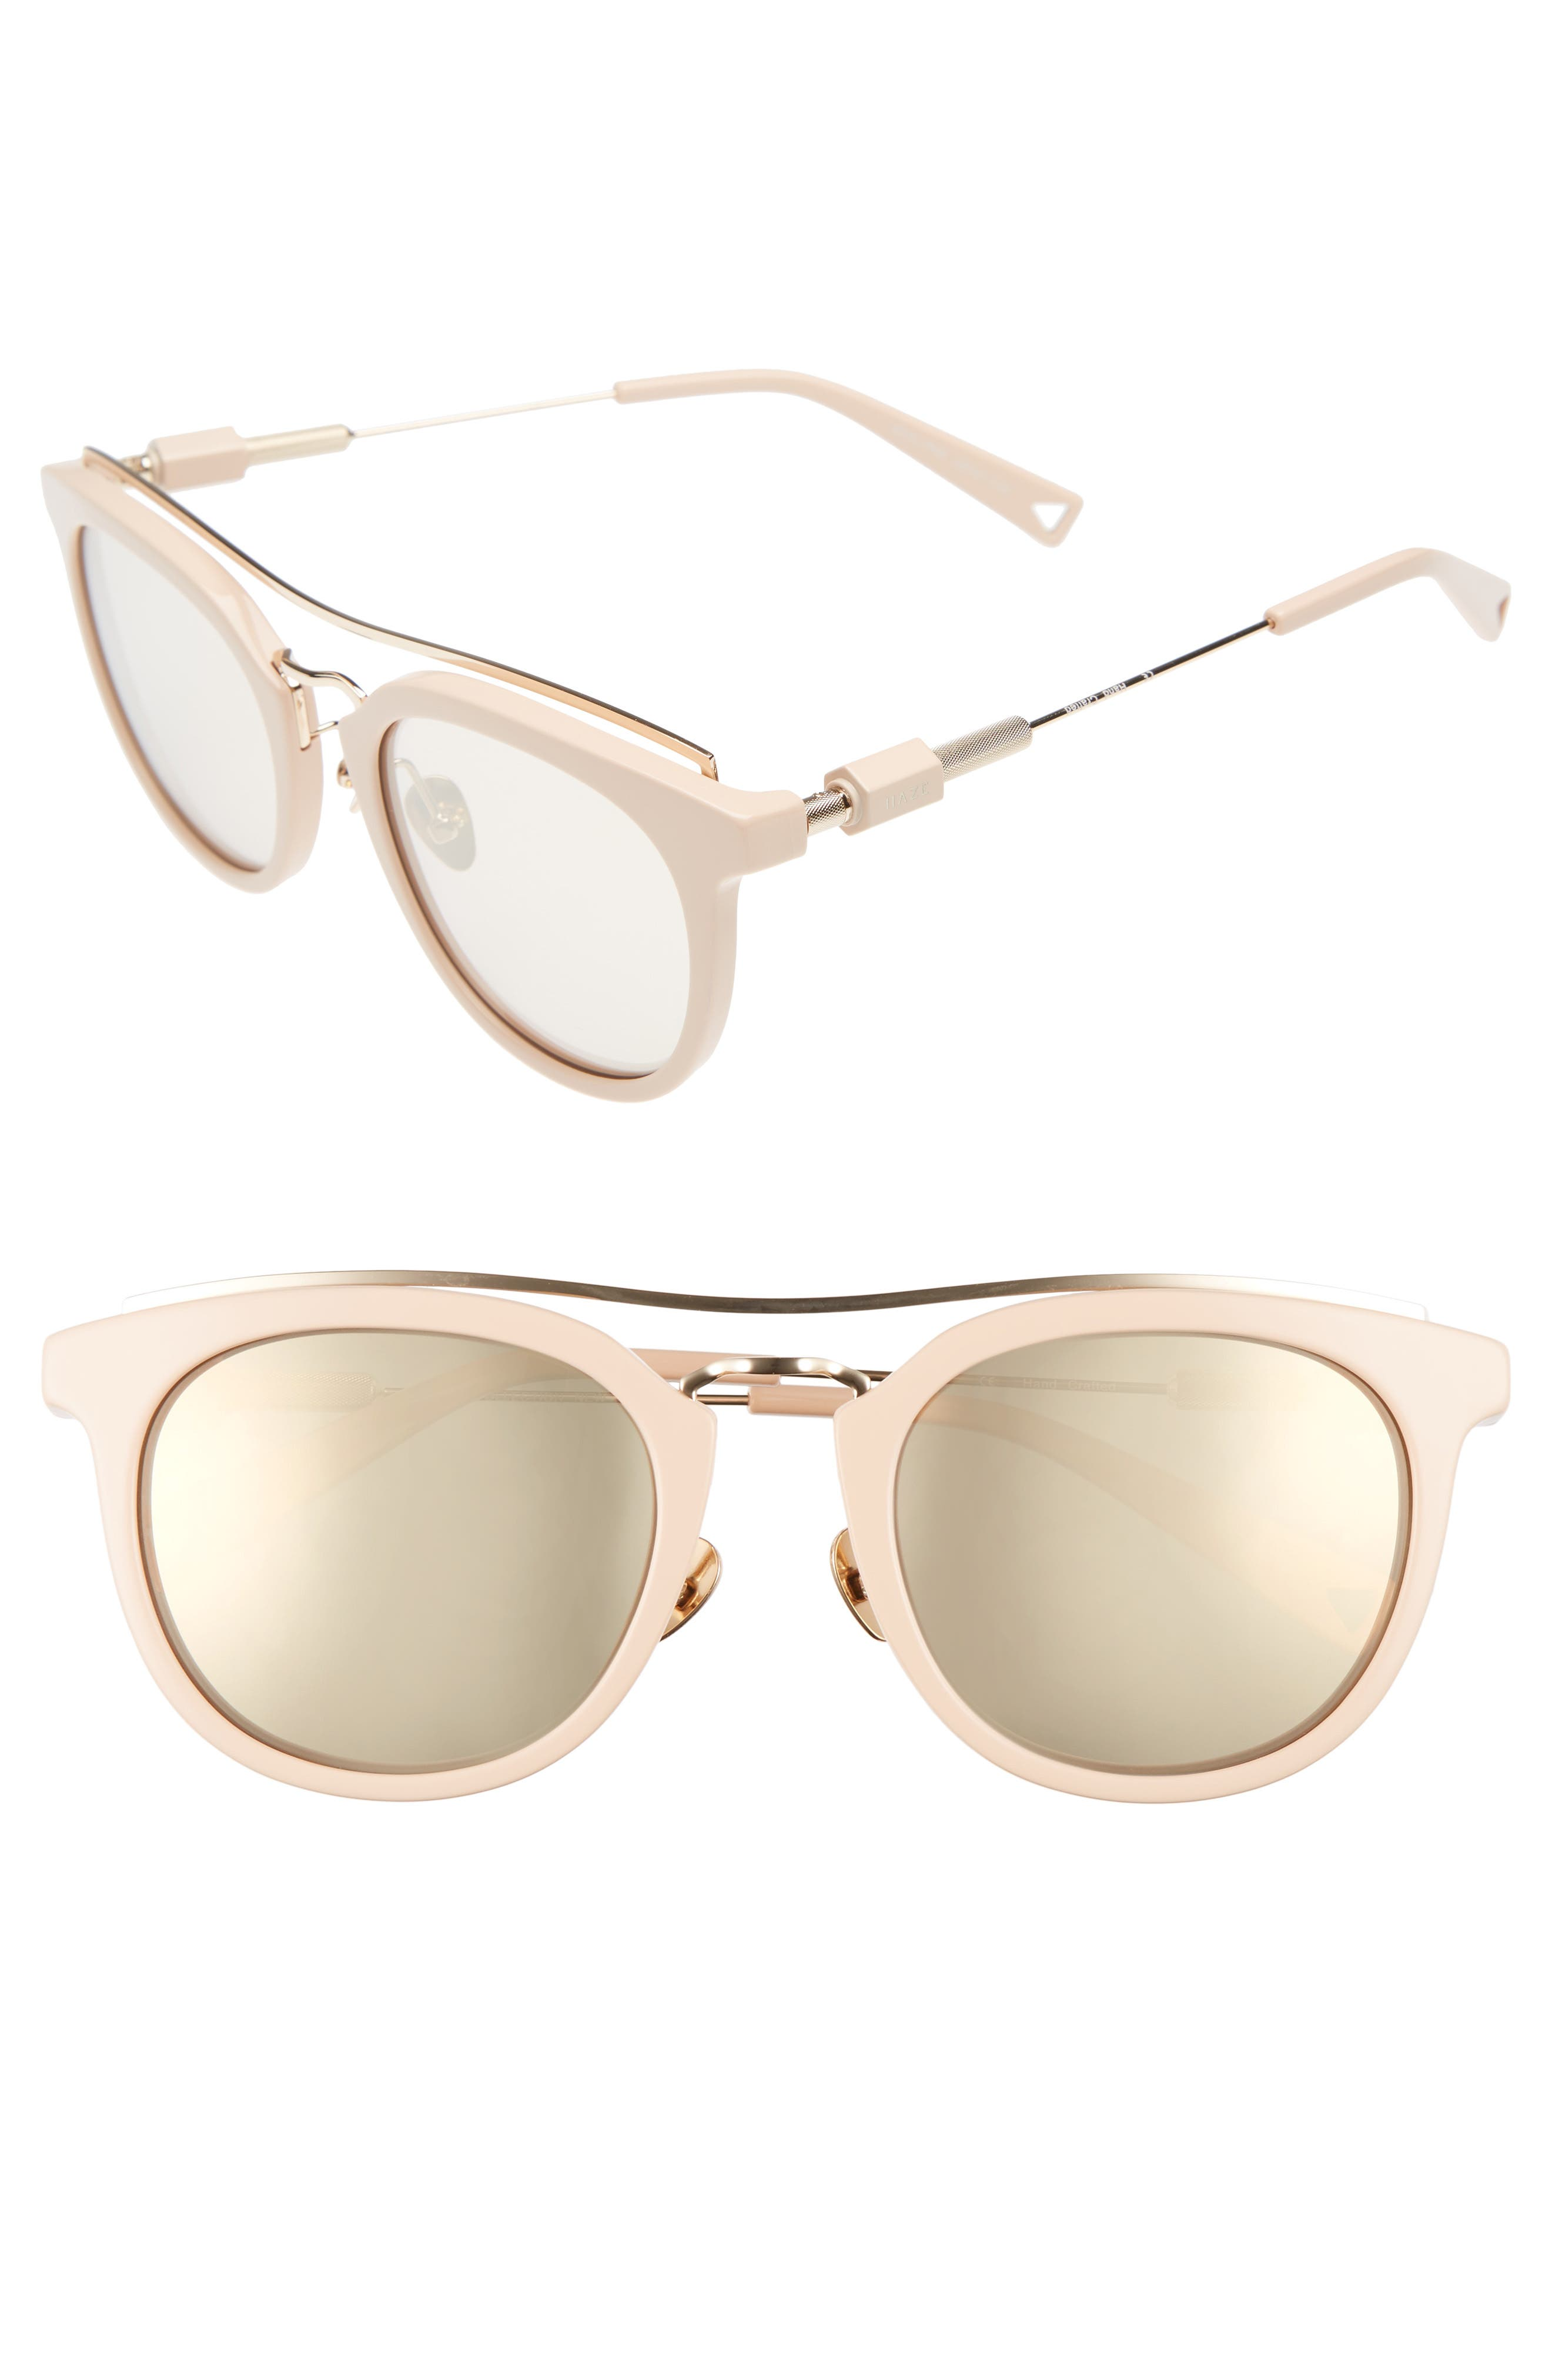 Zeal 52mm Aviator Sunglasses,                             Main thumbnail 1, color,